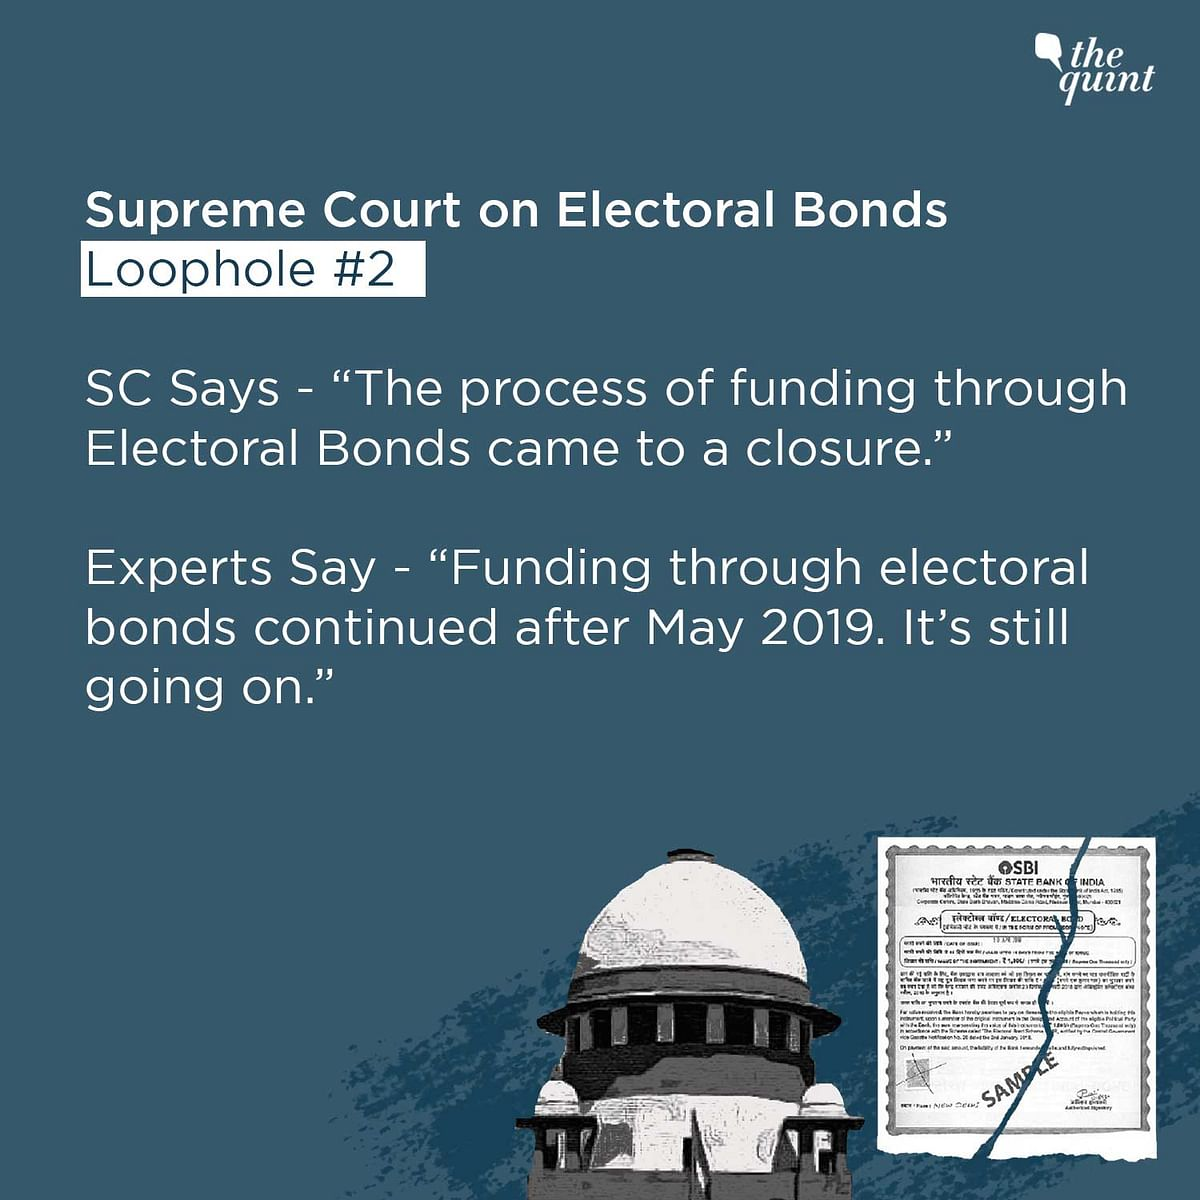 Supreme Court Order on Electoral Bonds Has Loopholes, Say Experts